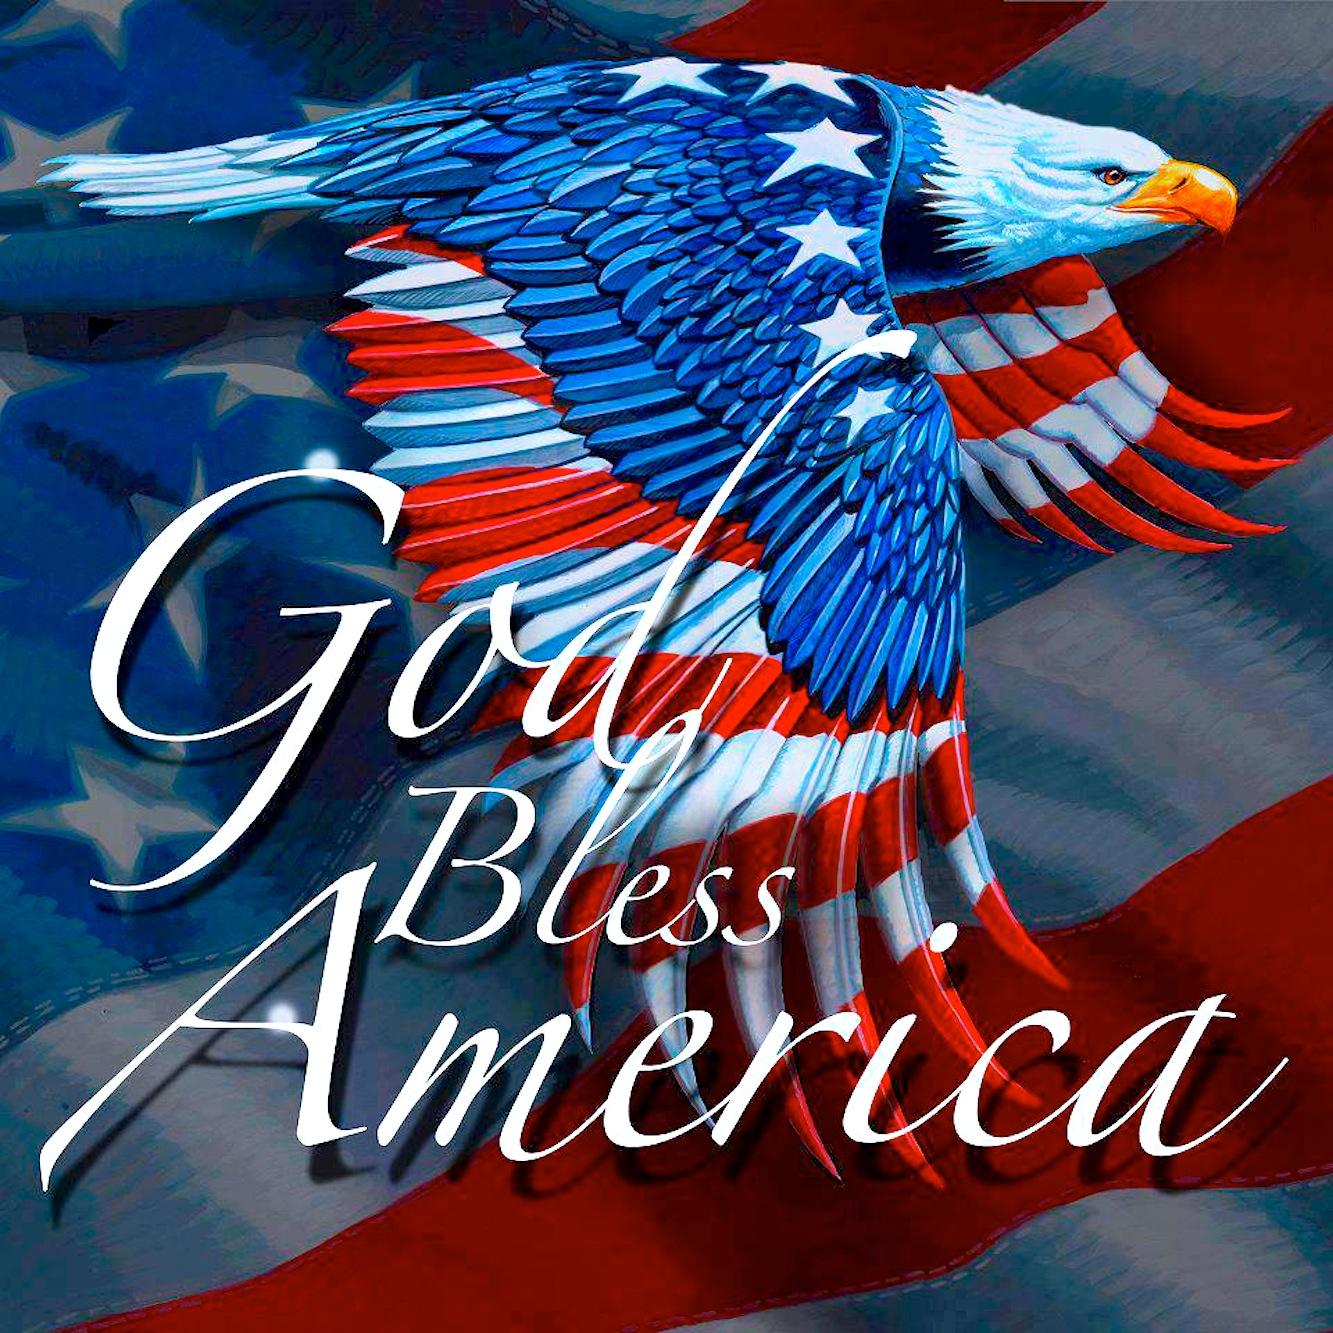 USA-united-states-of-america-33748624-1333-1333